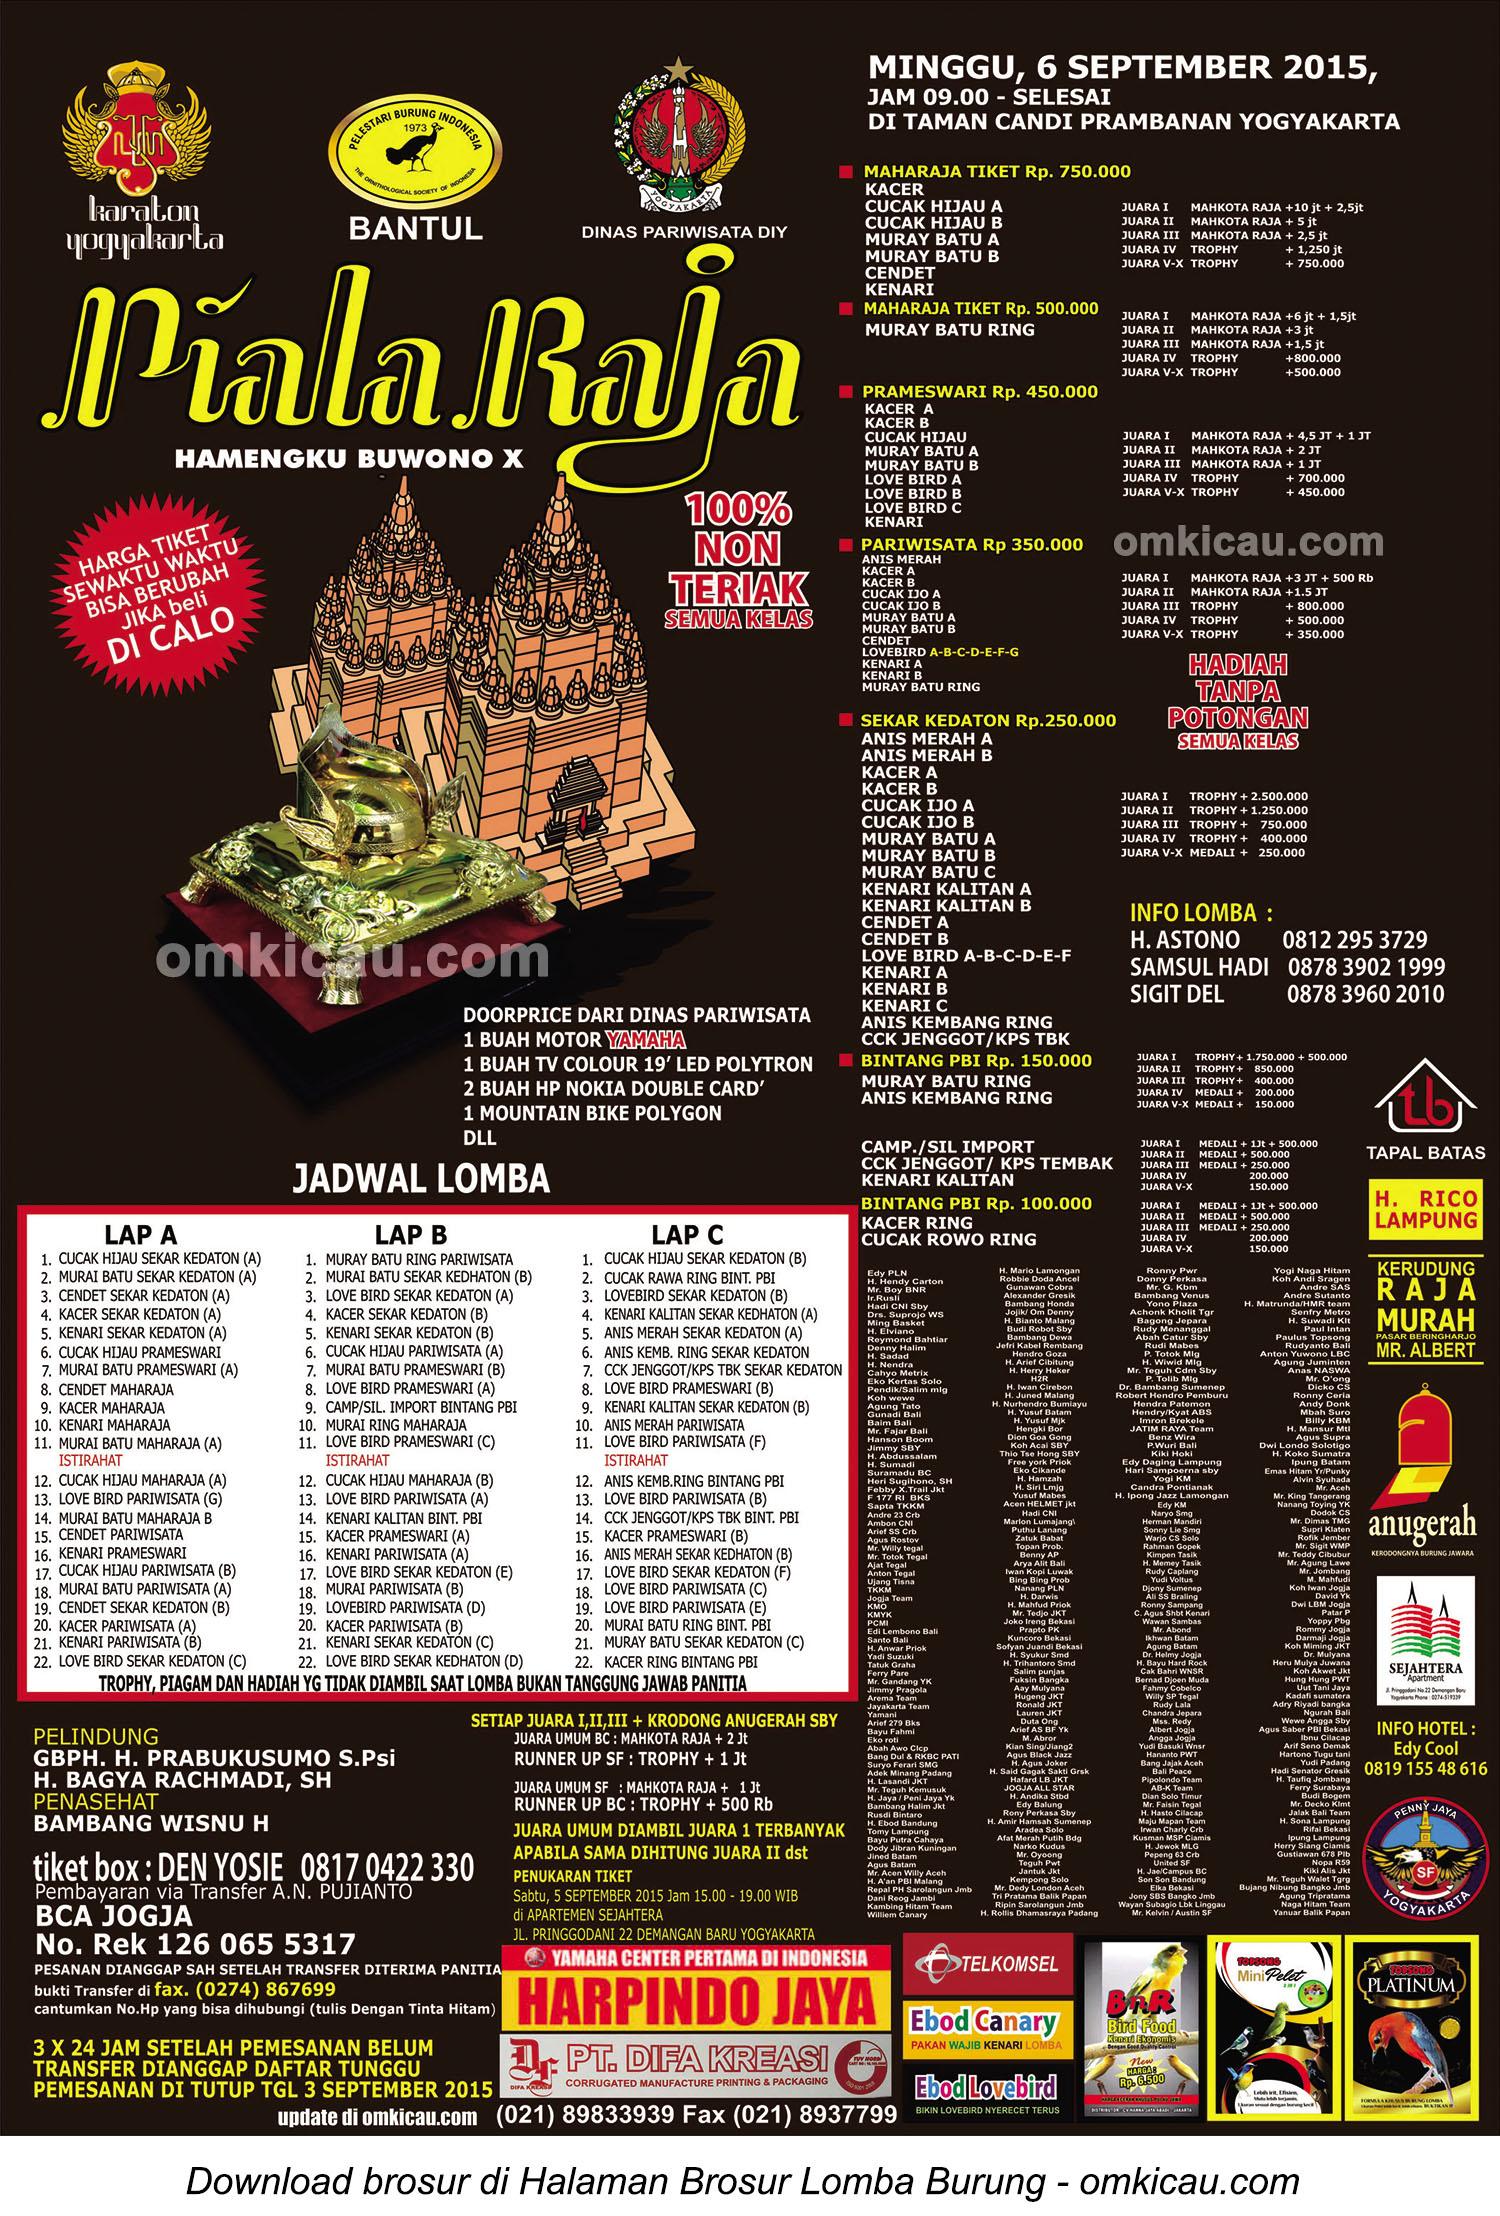 Brosur Lomba Burung Berkicau Piala Raja, Jogja, Minggu 6 September 2015